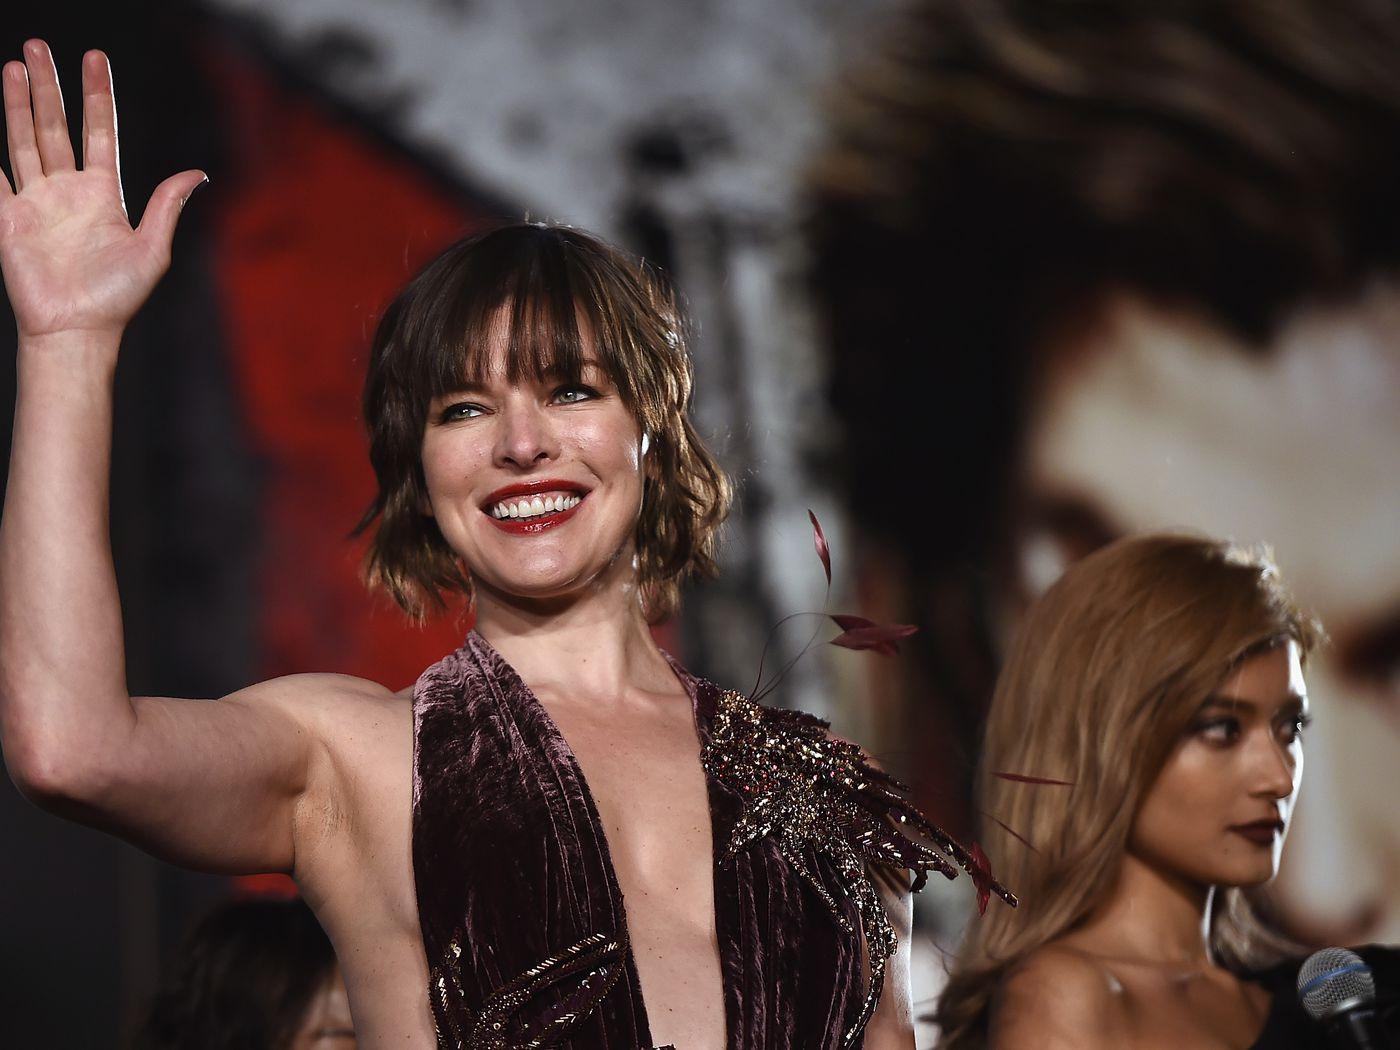 Milla Jovovich Monster Hunter Szornyvadasz Kinai Mozi Rasszista Vicc